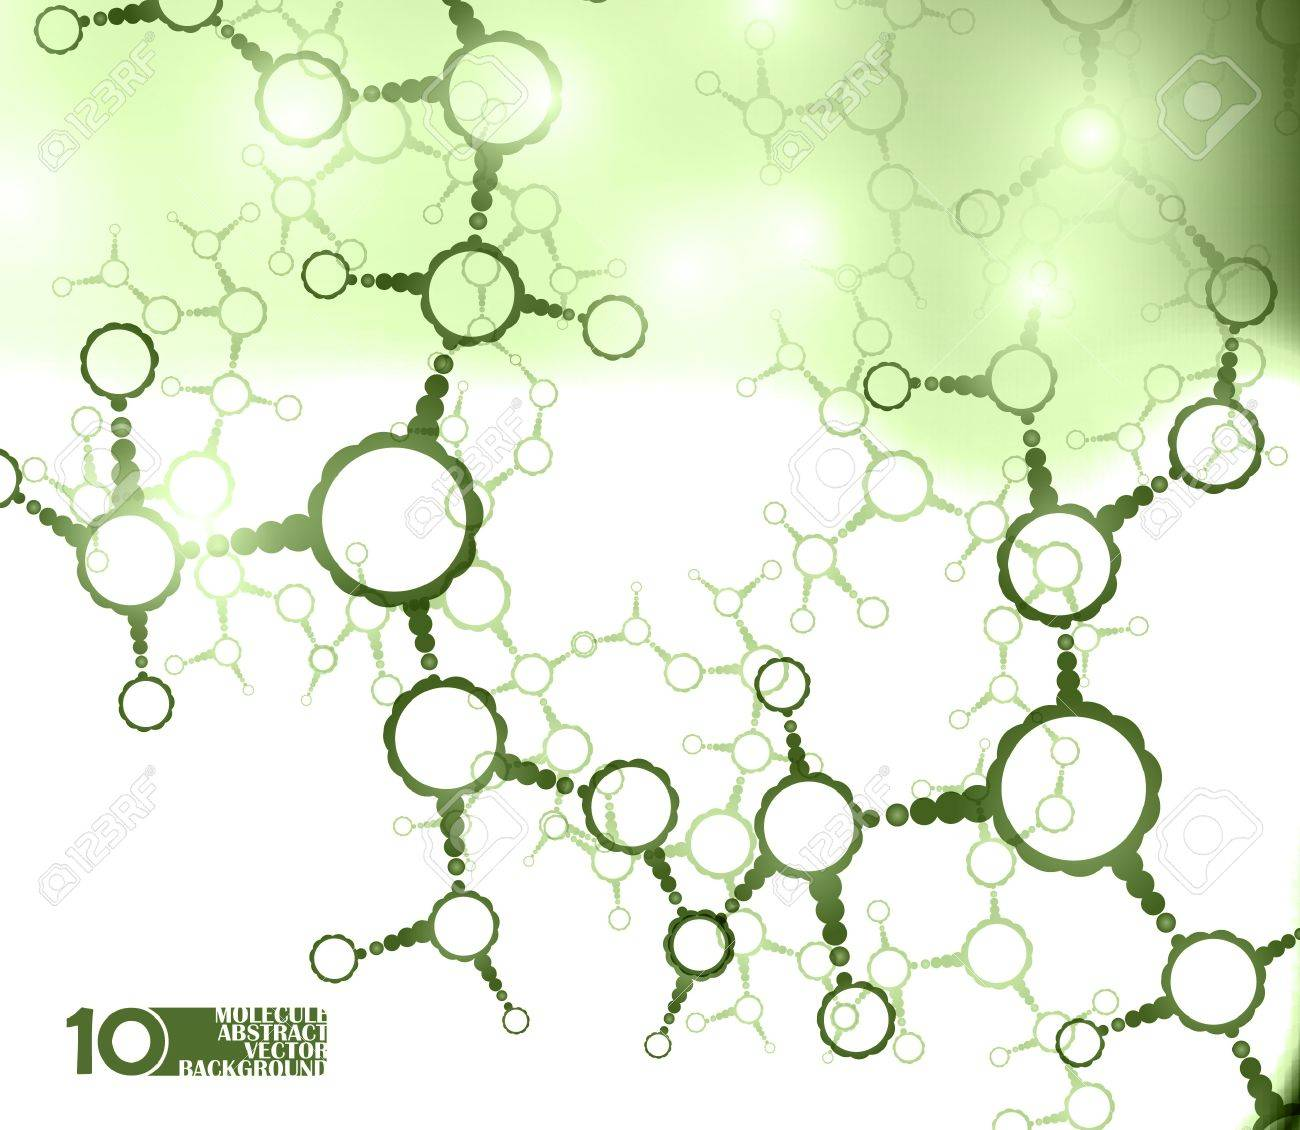 Futuristic dna, abstract molecule, cell illustration eps10 Stock Vector - 11862624